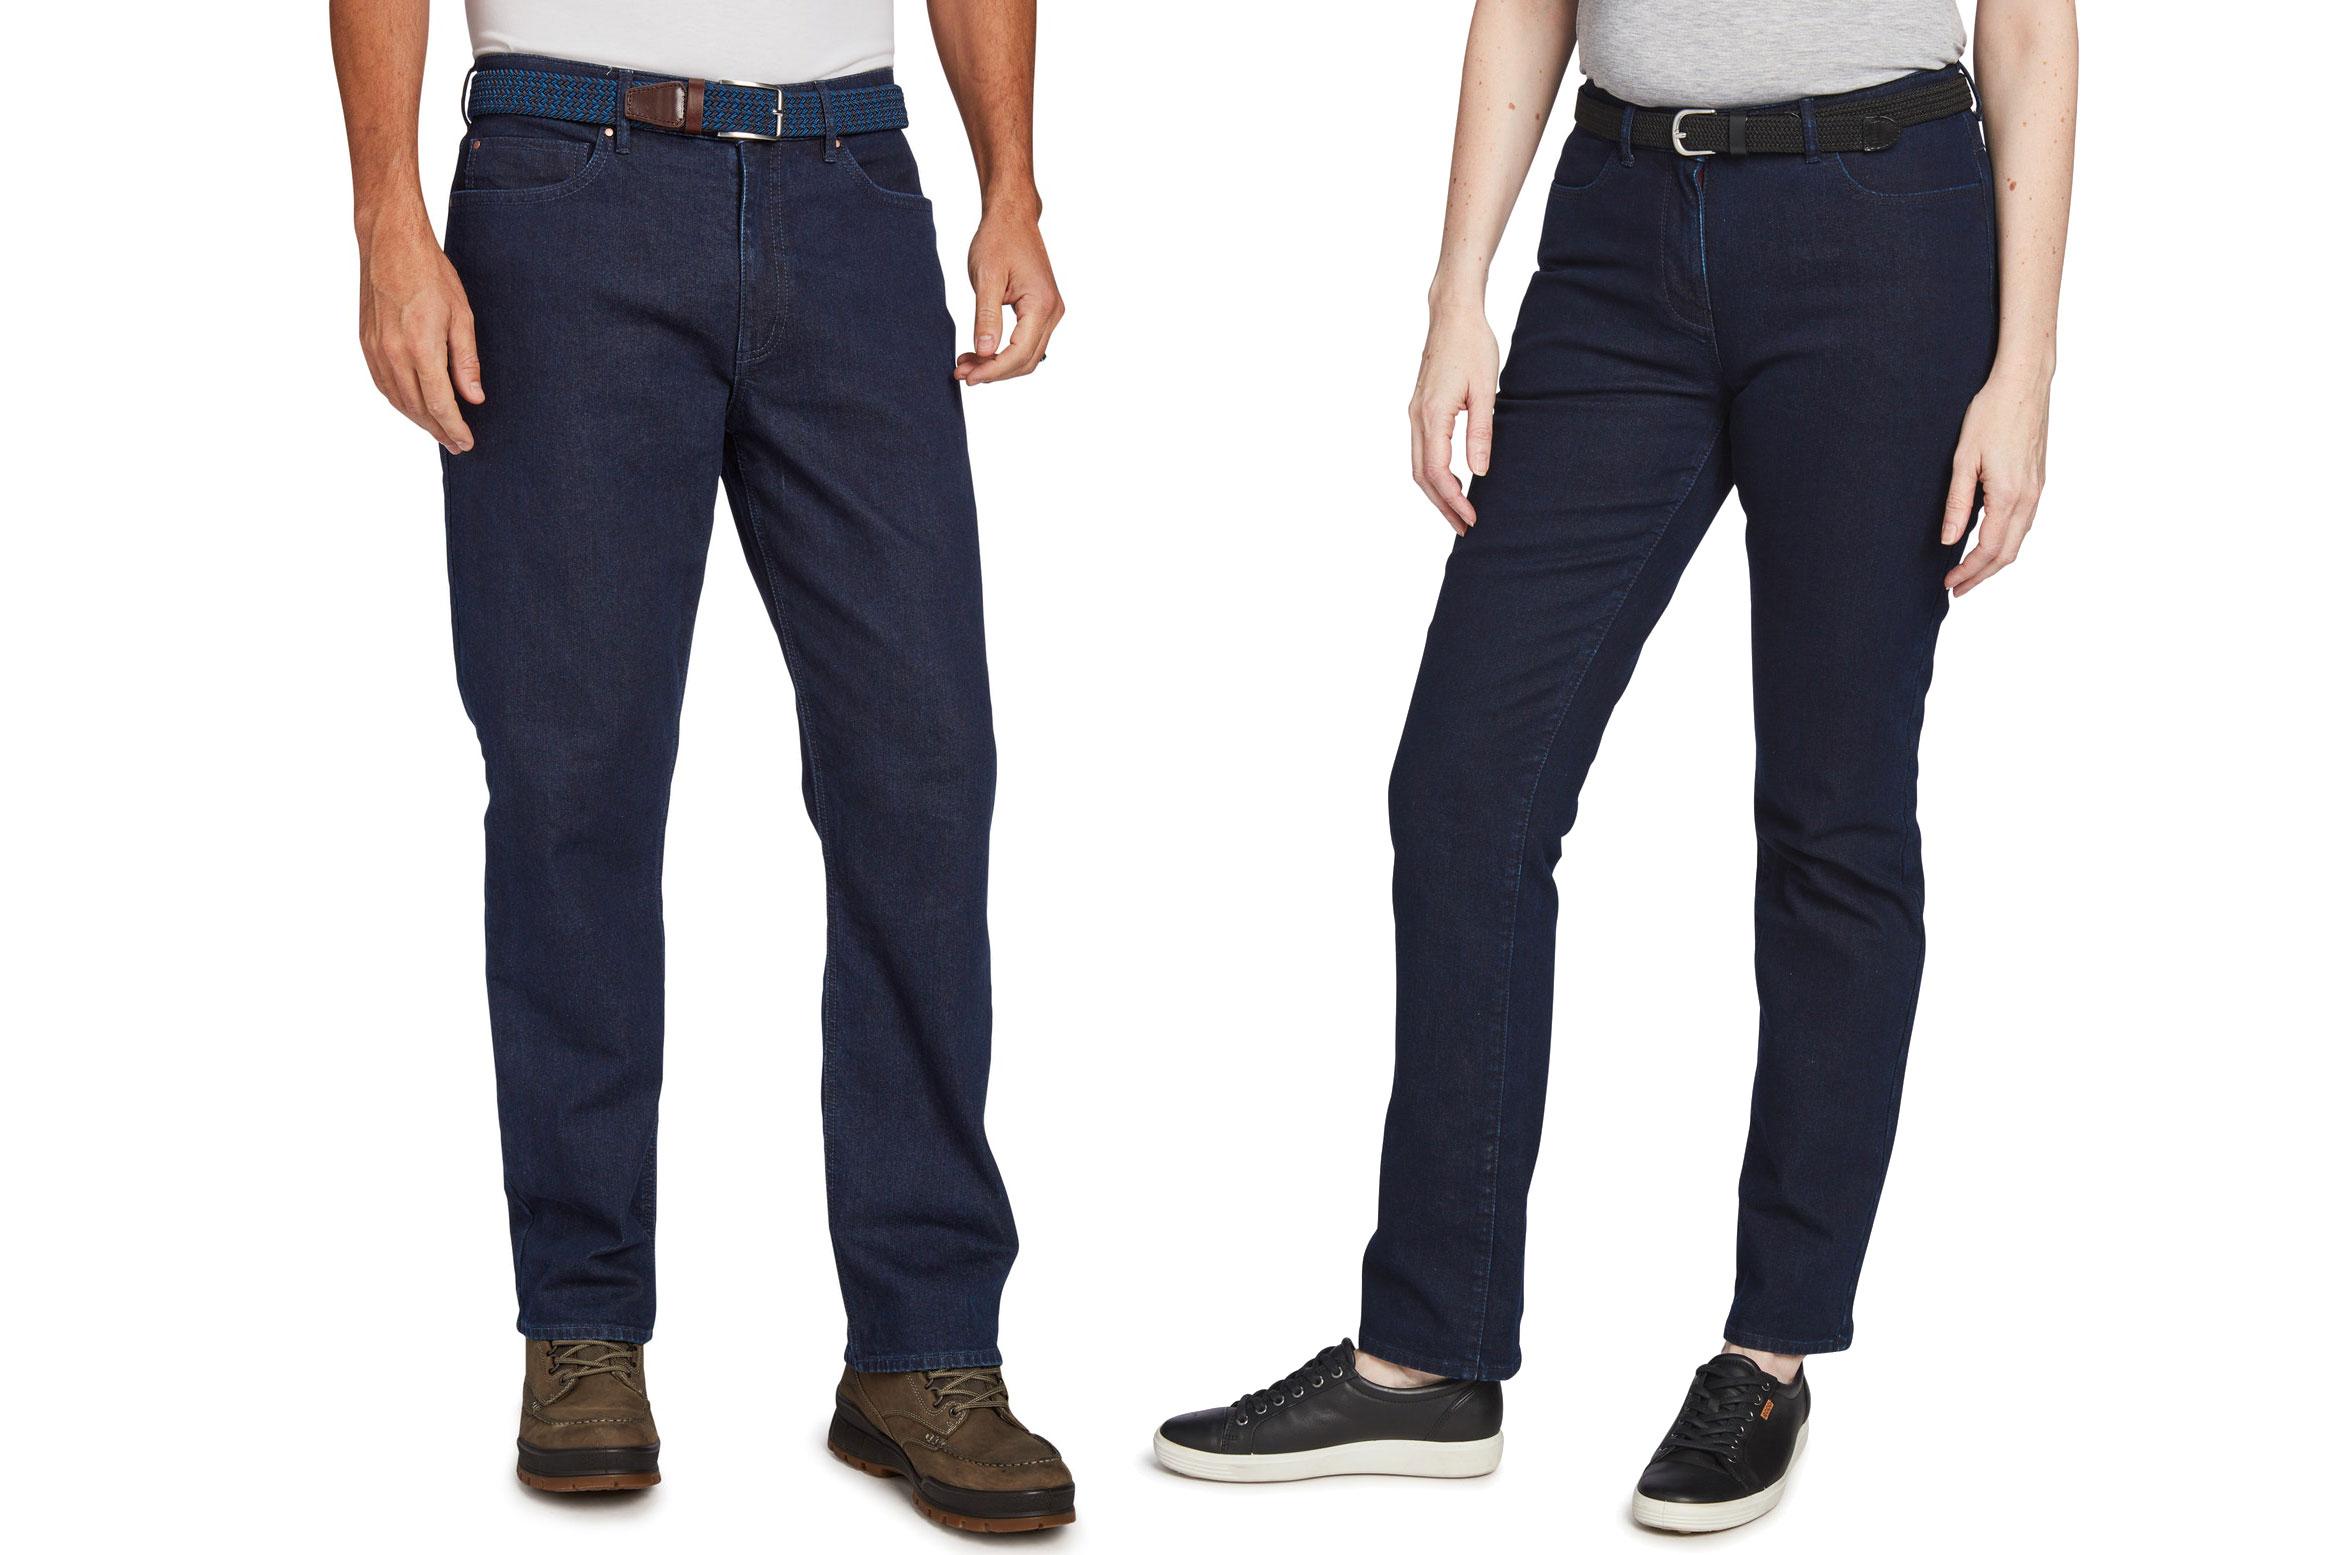 Rohan Nordic Jeans